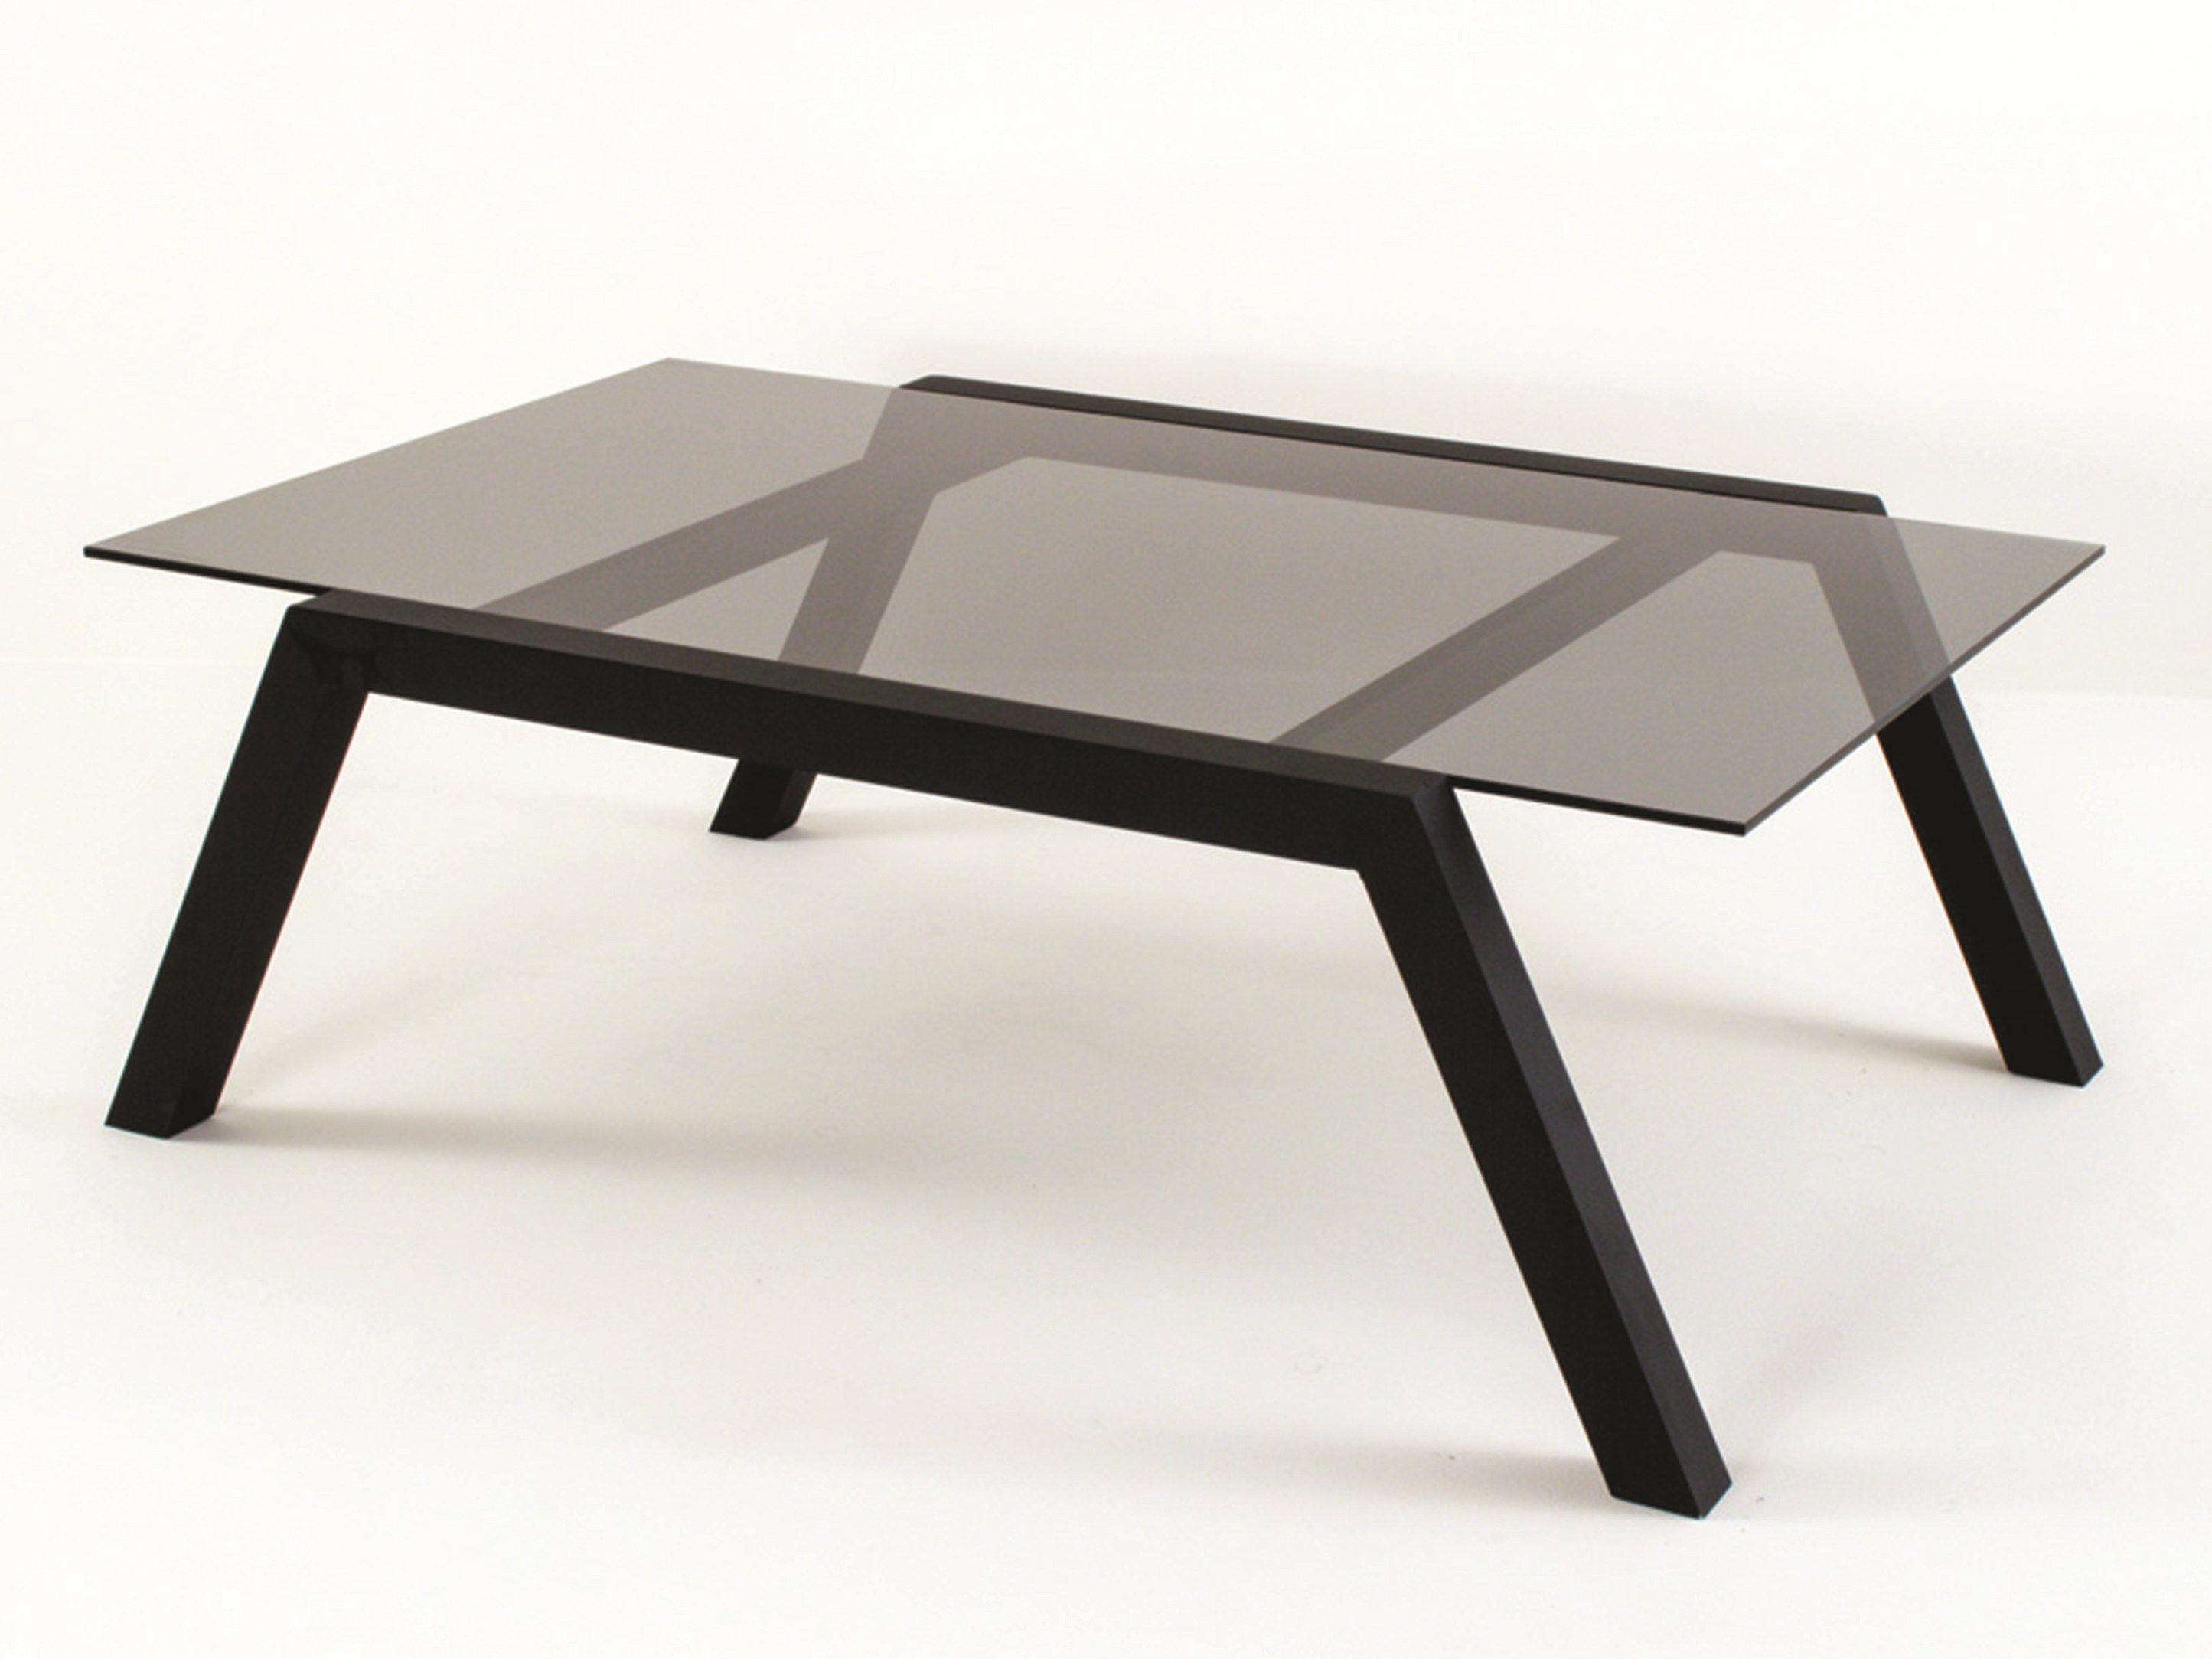 Corner Aluminium Coffee Table Corner Collection By Efasma Design Amass Studio